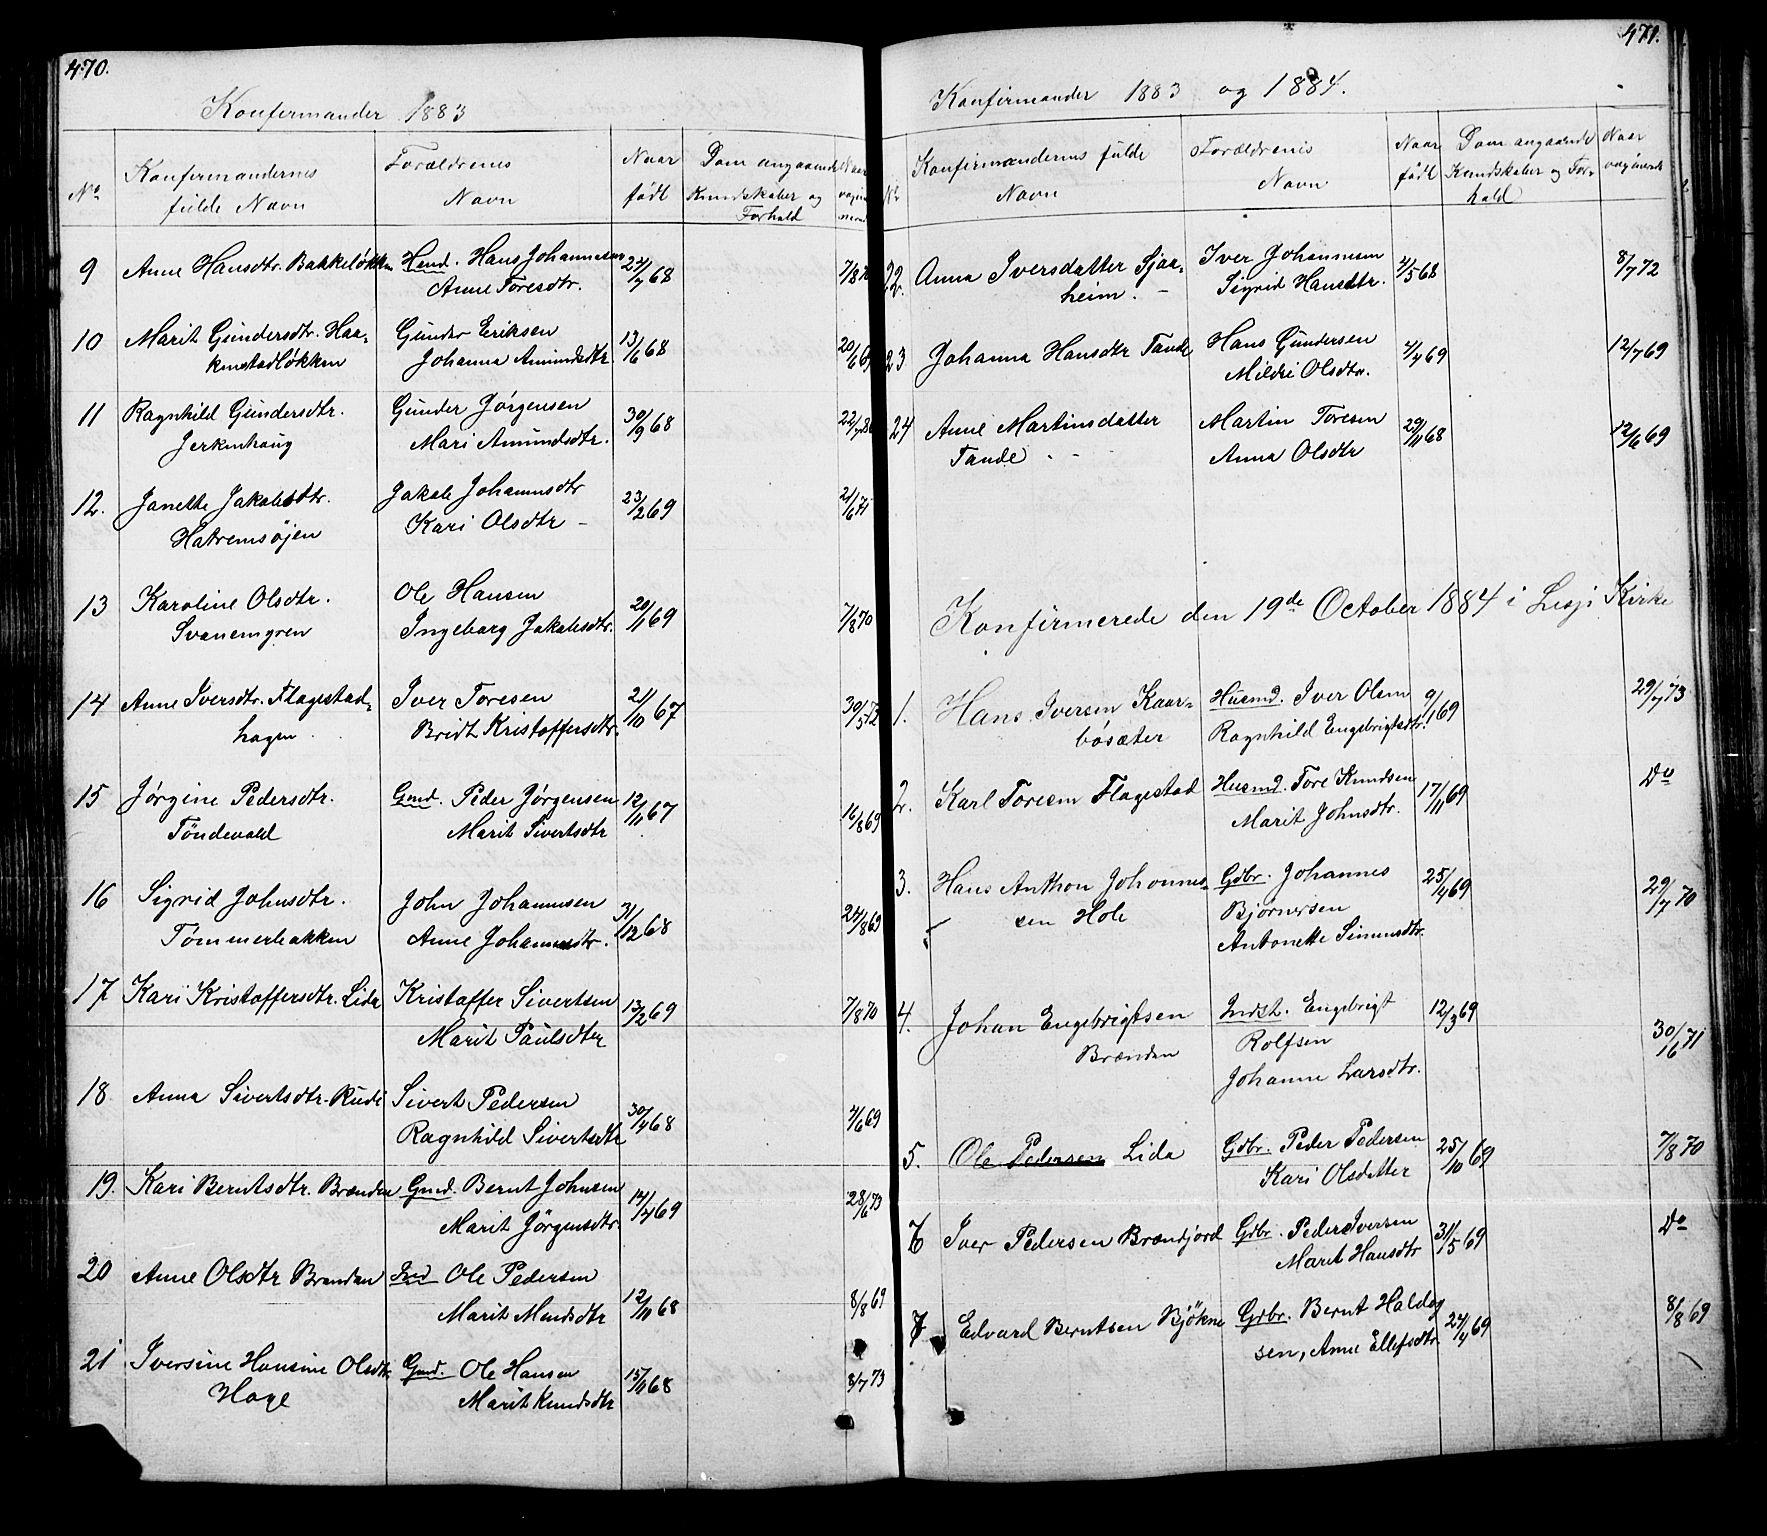 SAH, Lesja prestekontor, Klokkerbok nr. 5, 1850-1894, s. 470-471